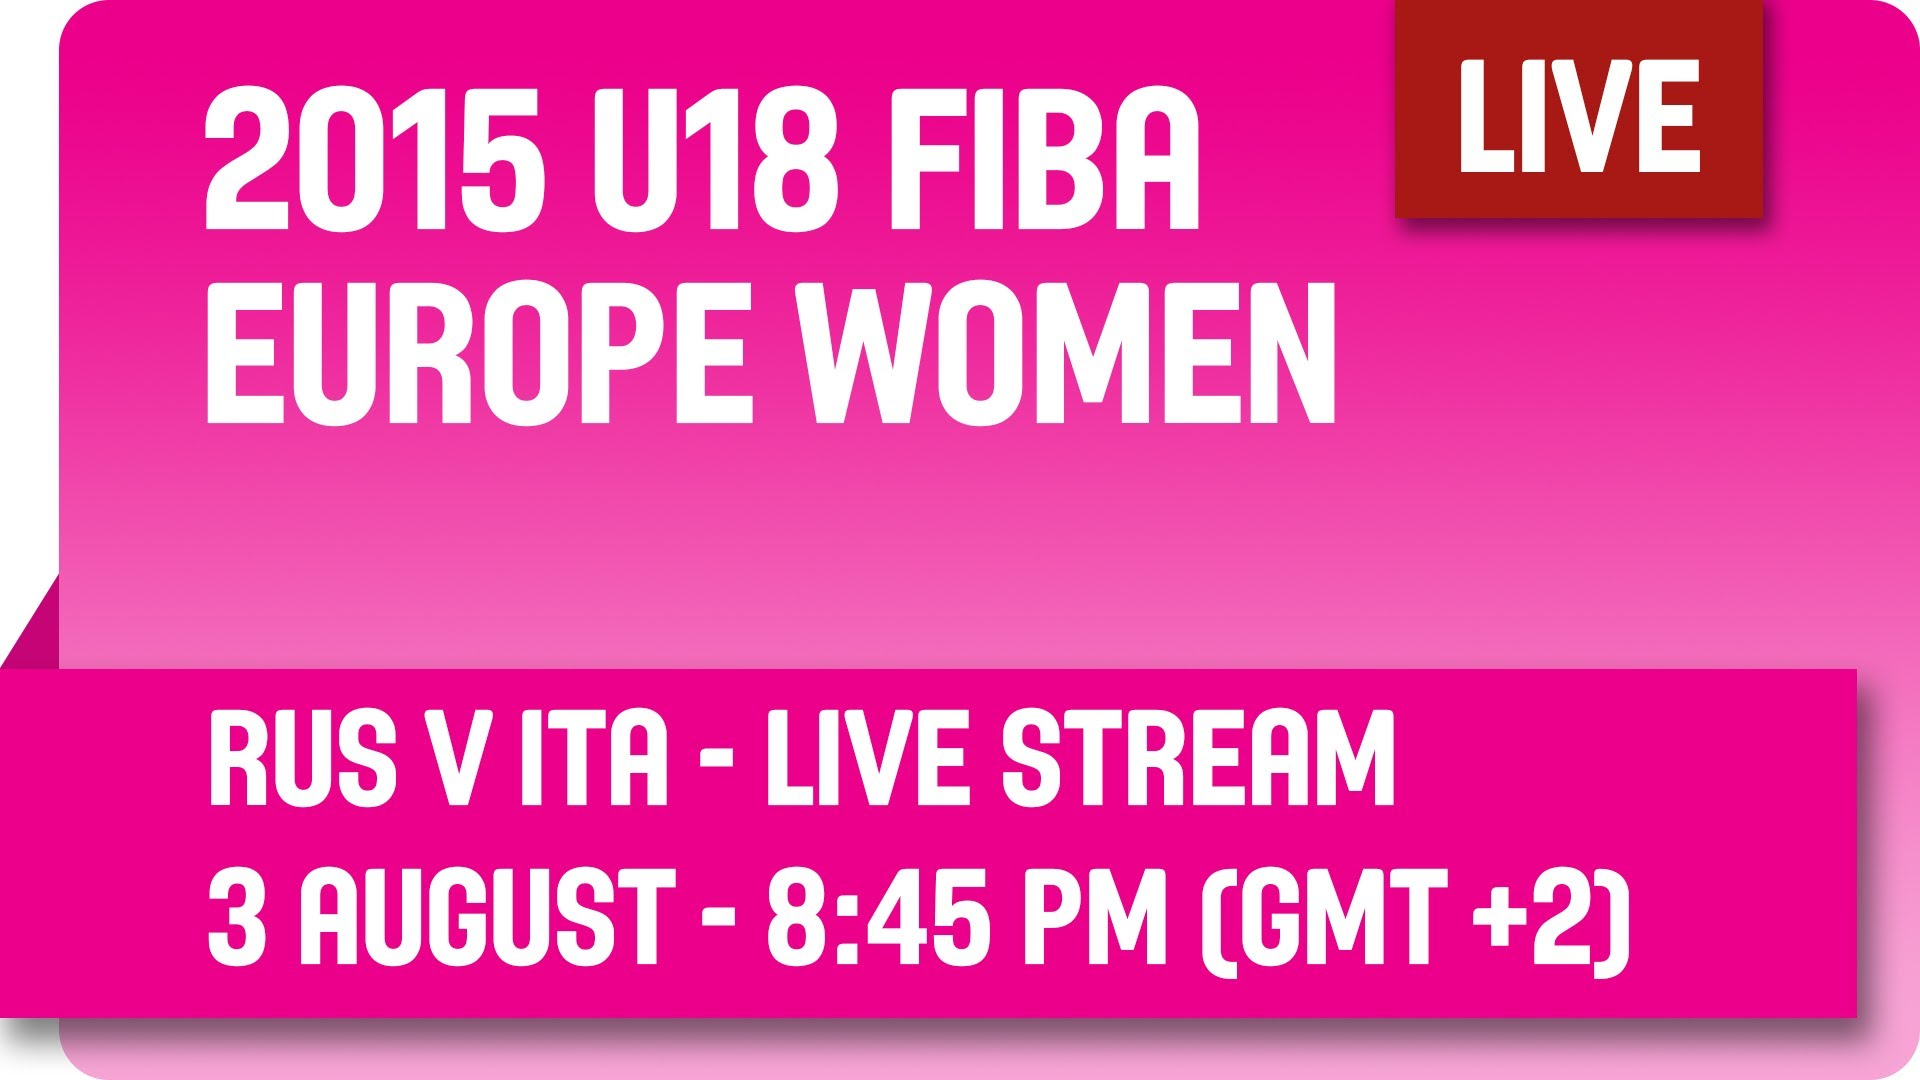 Russia v Italy - Group E - Live Stream - 2015 U18 European Championship Women